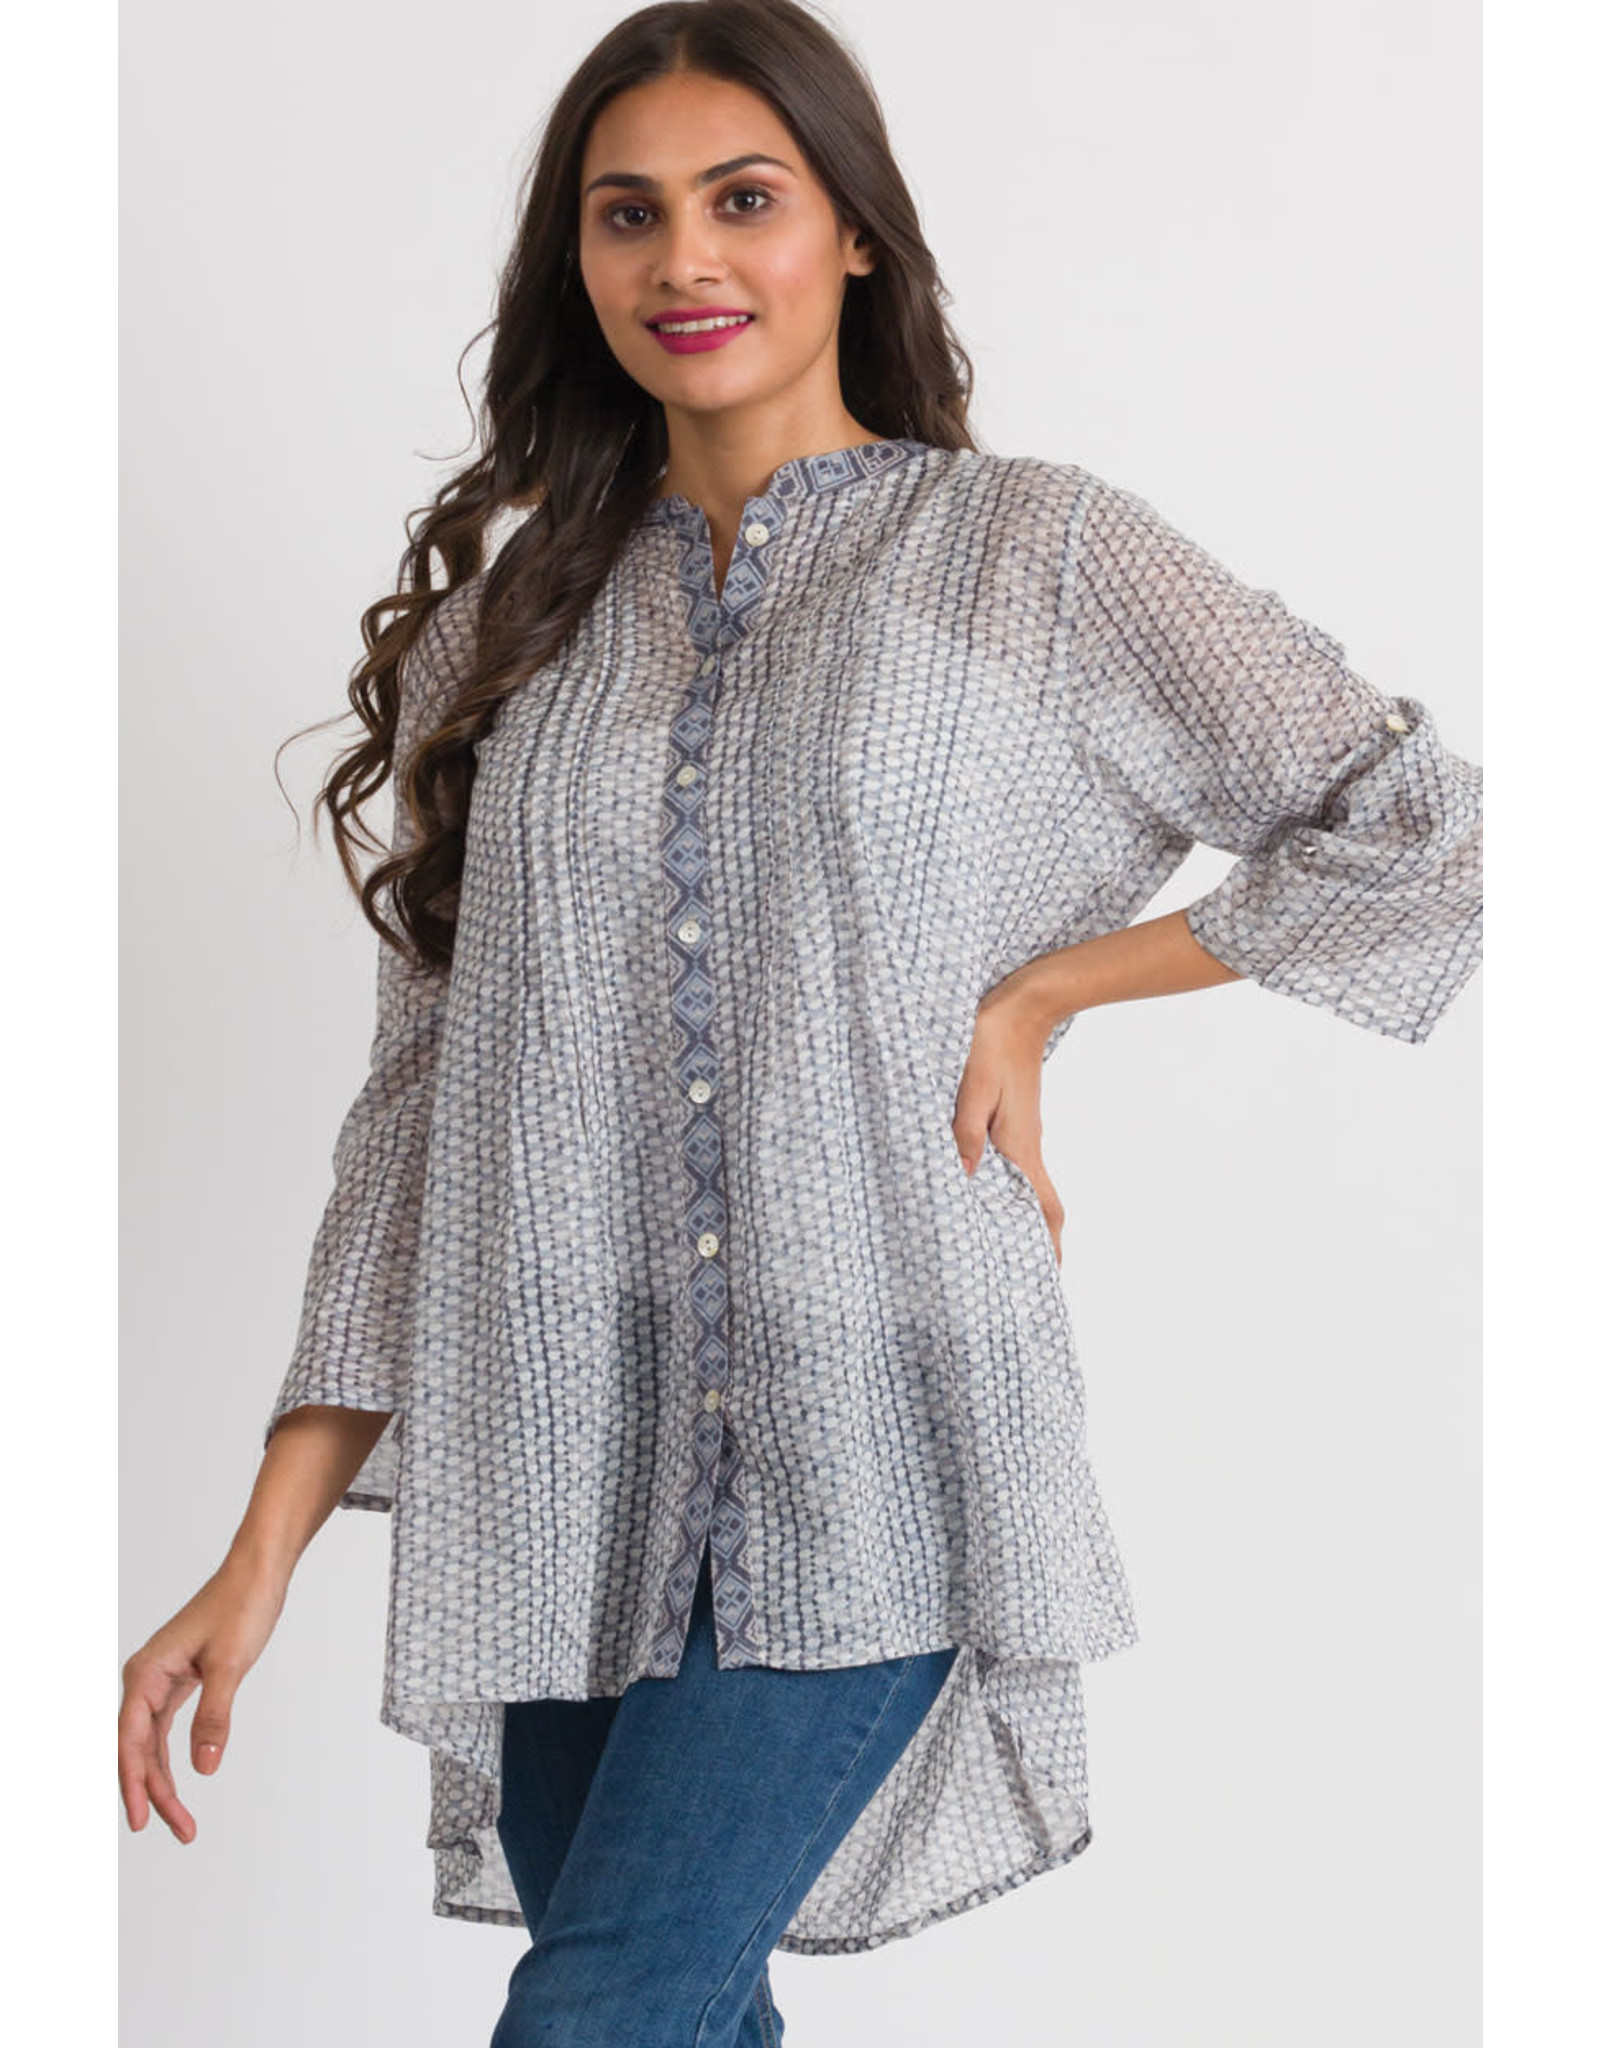 Amisha Cotton Tunic, O/S, Charcoal, India